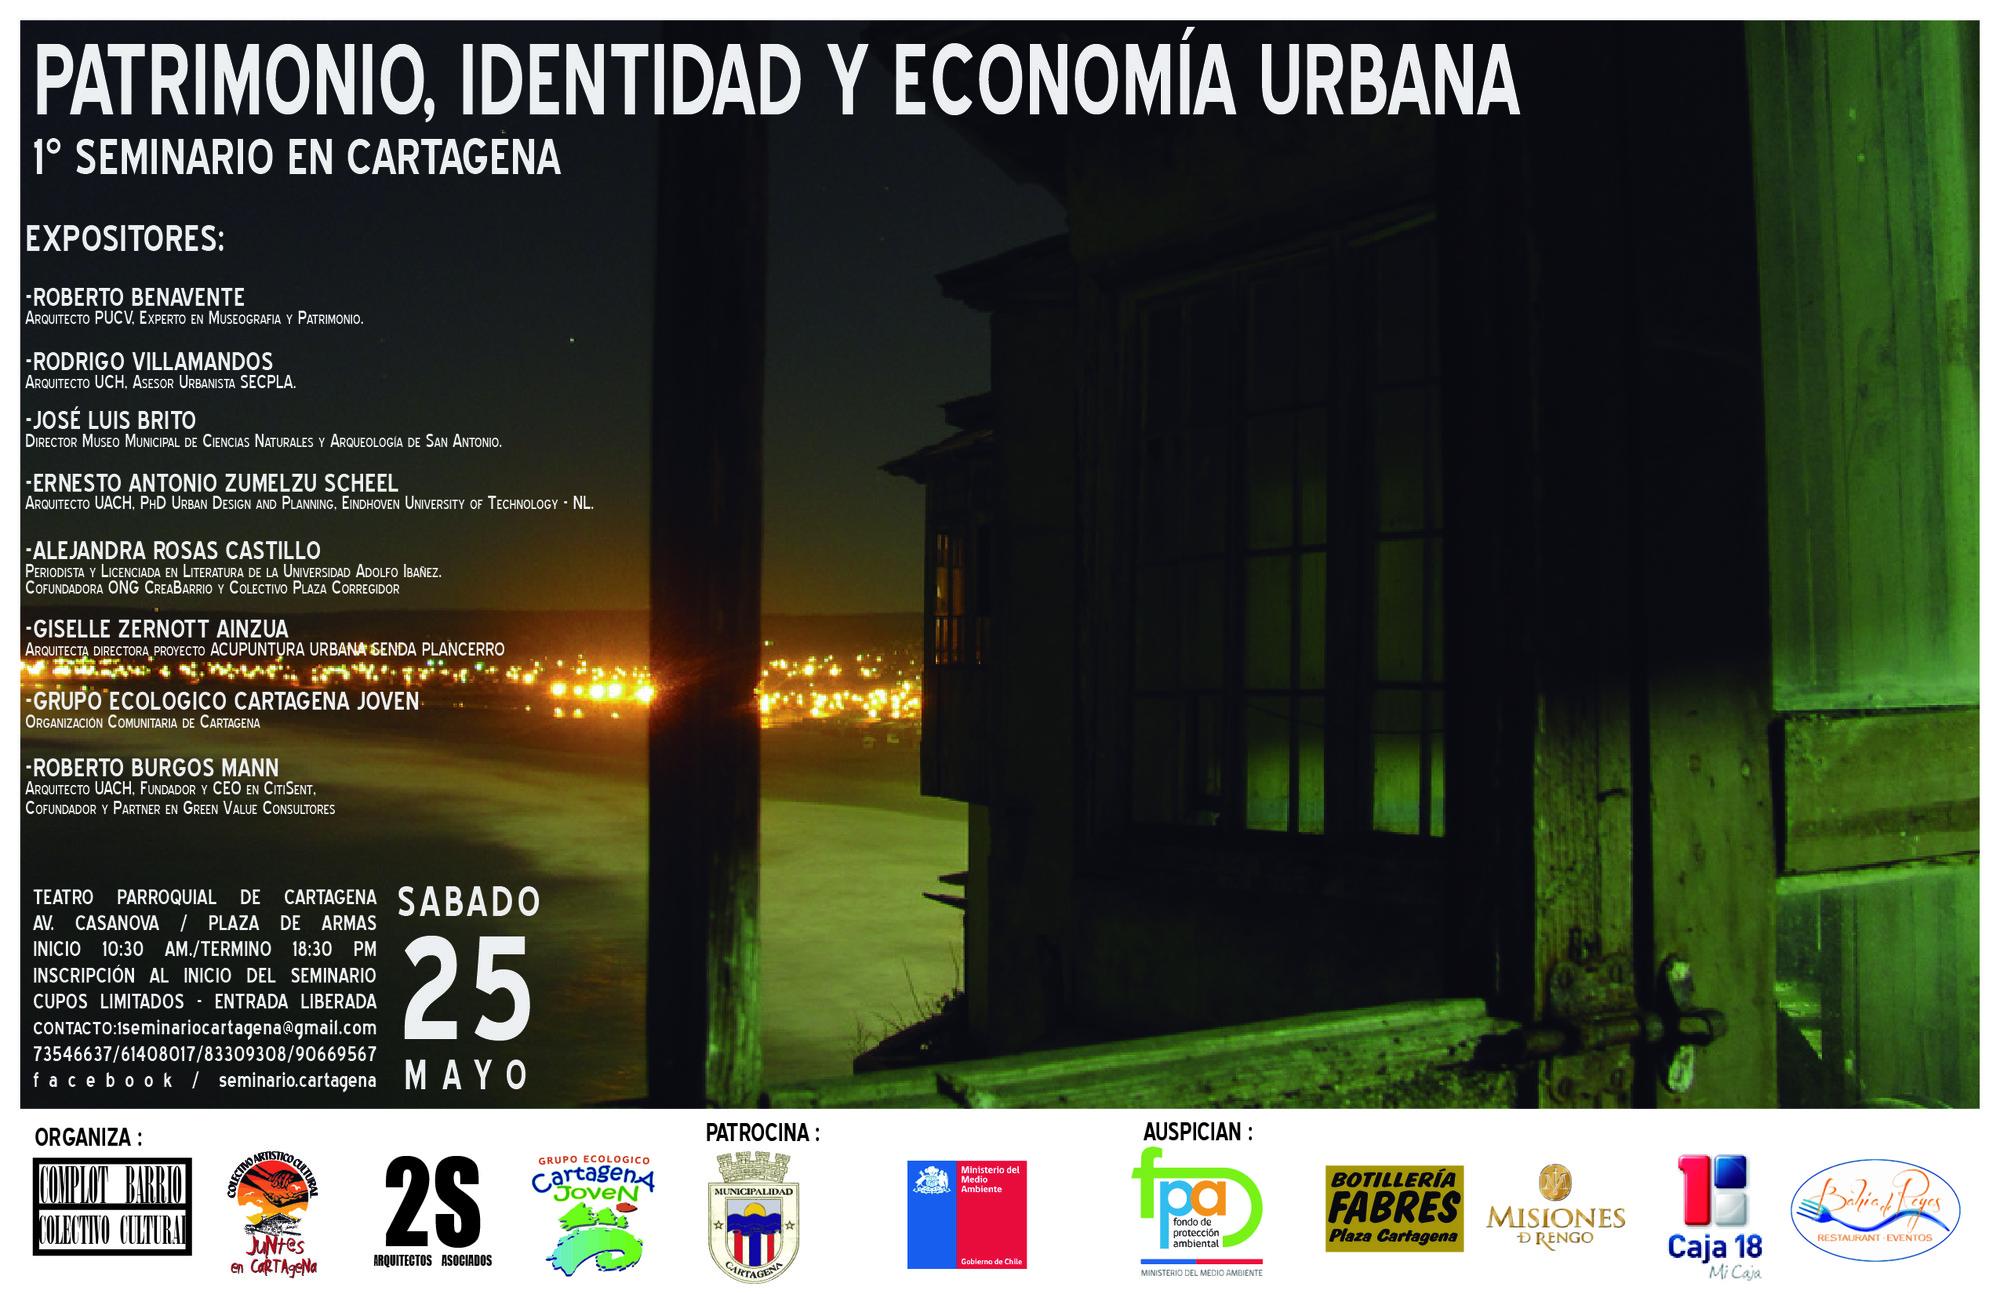 Seminario Patrimonio e Identidad Urbana en Cartagena